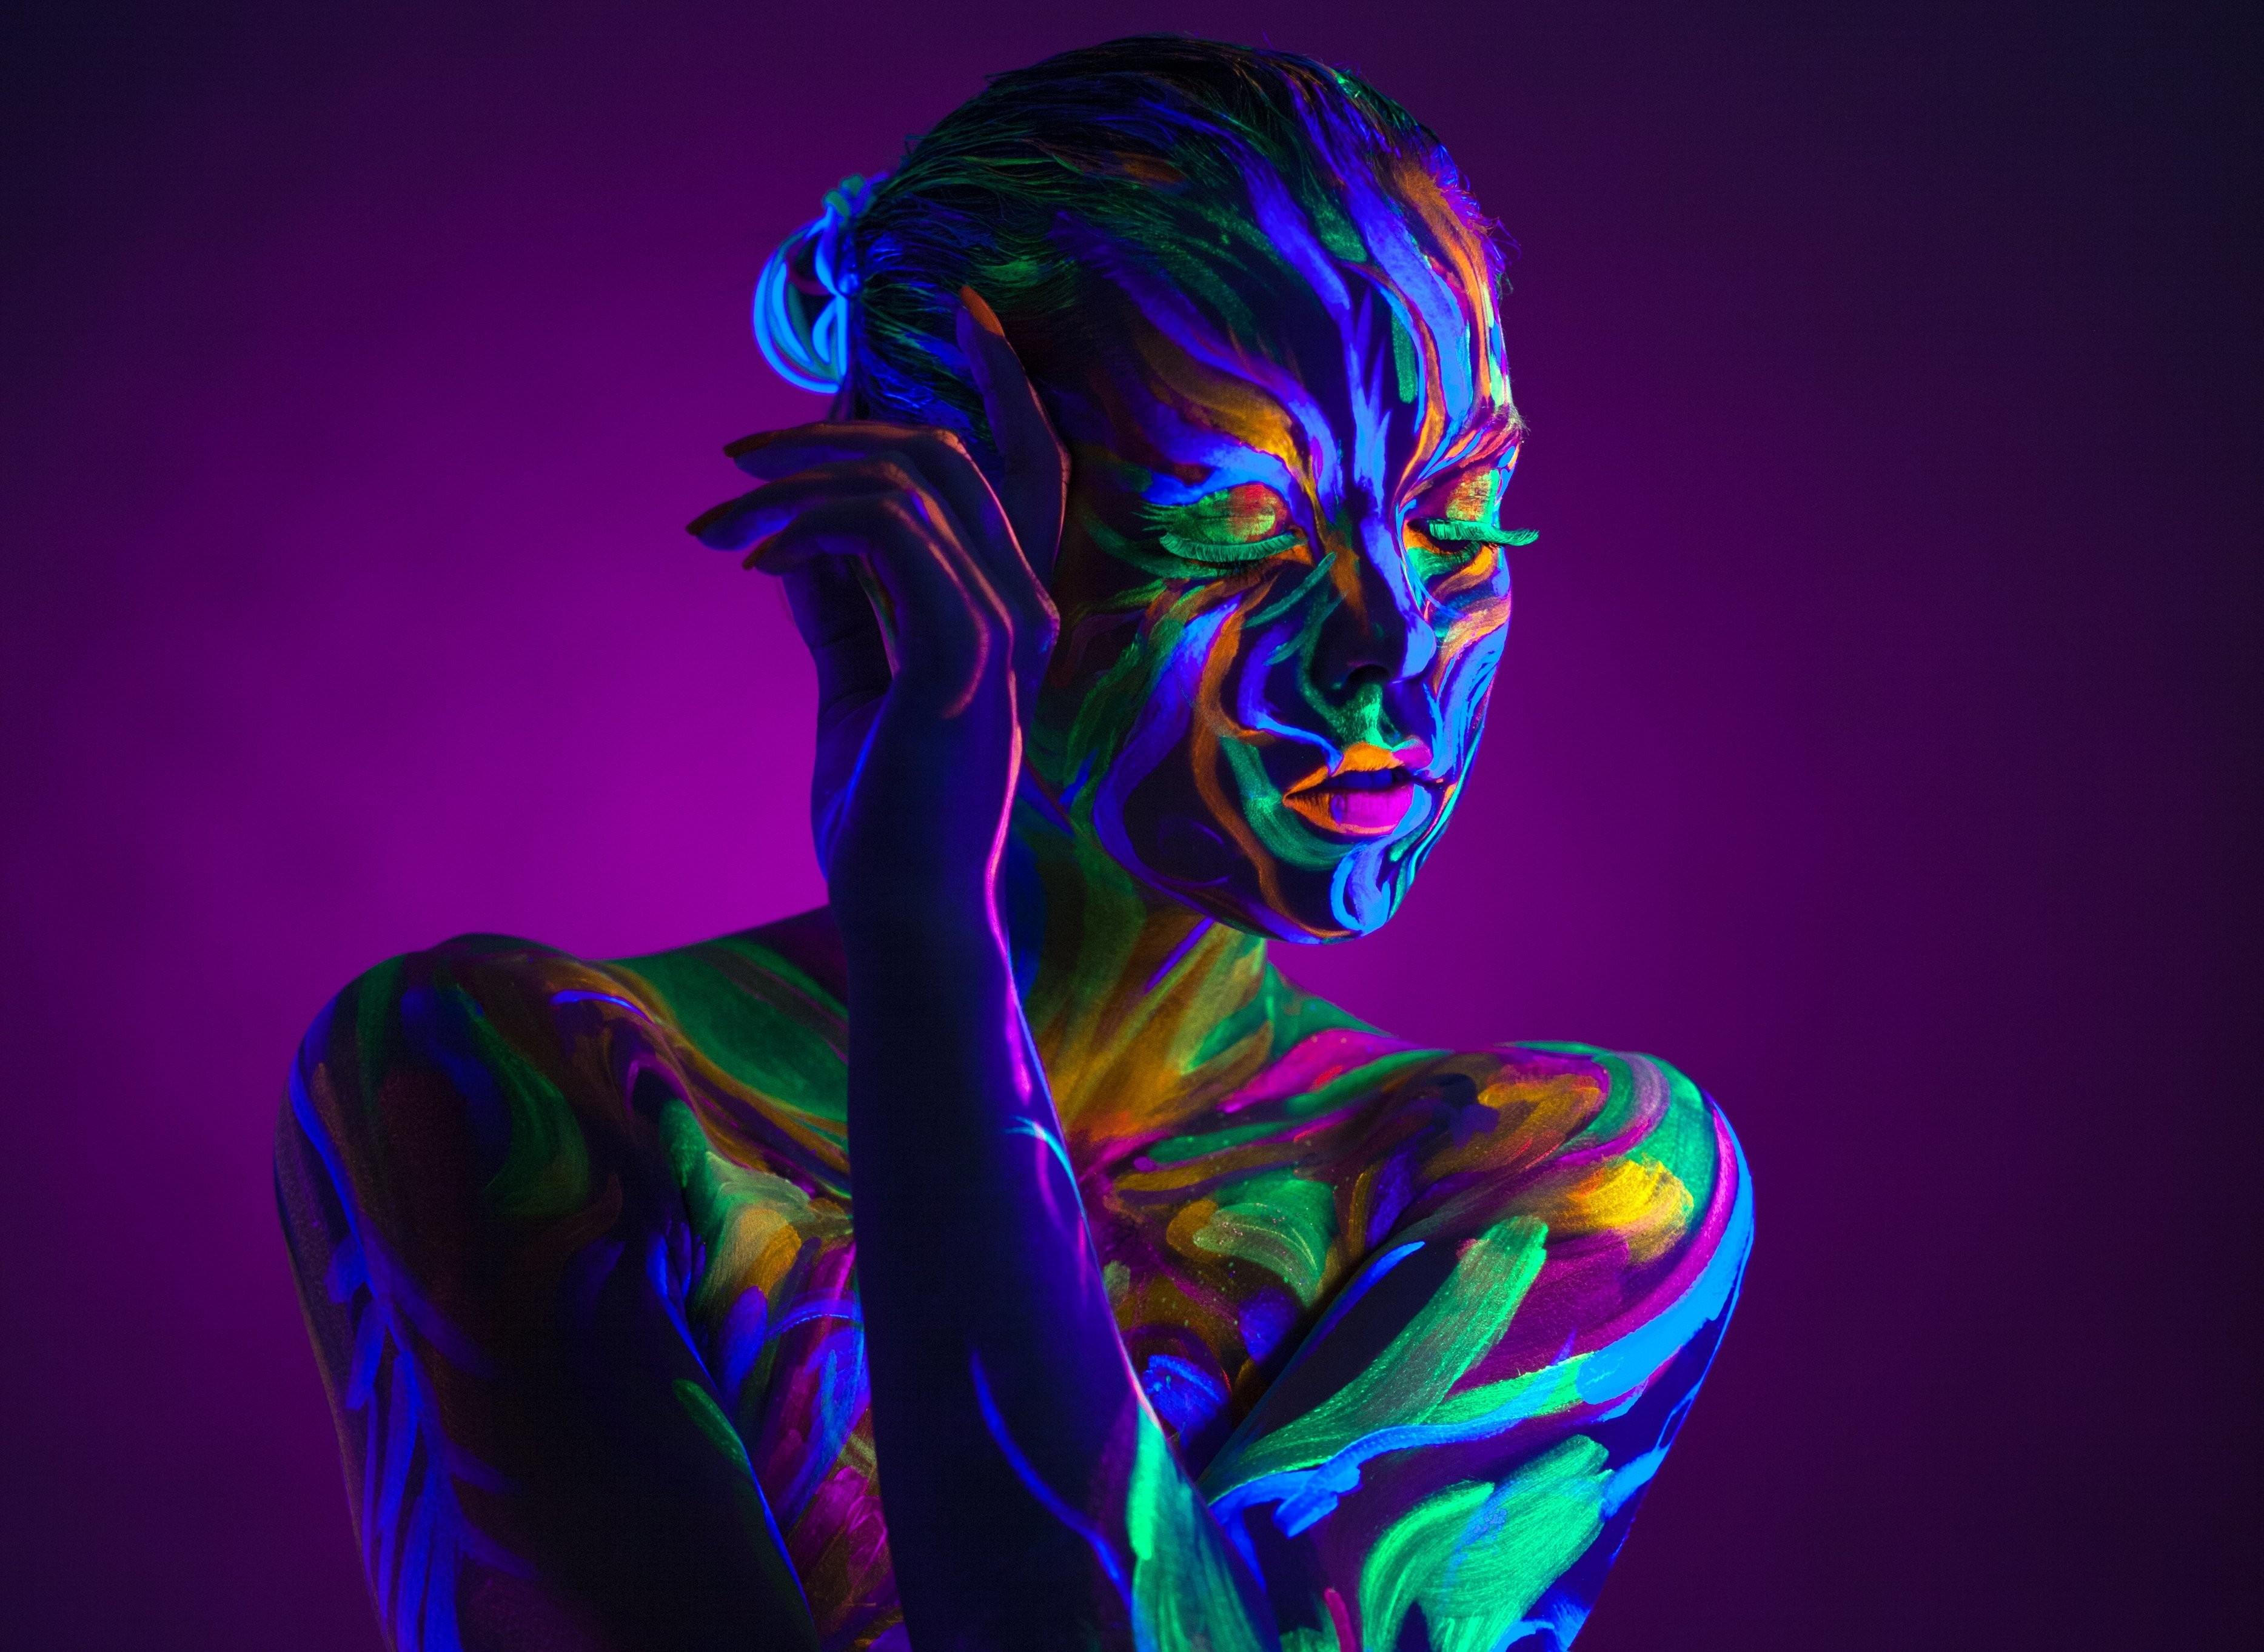 neon girl wallpaper impremedianet